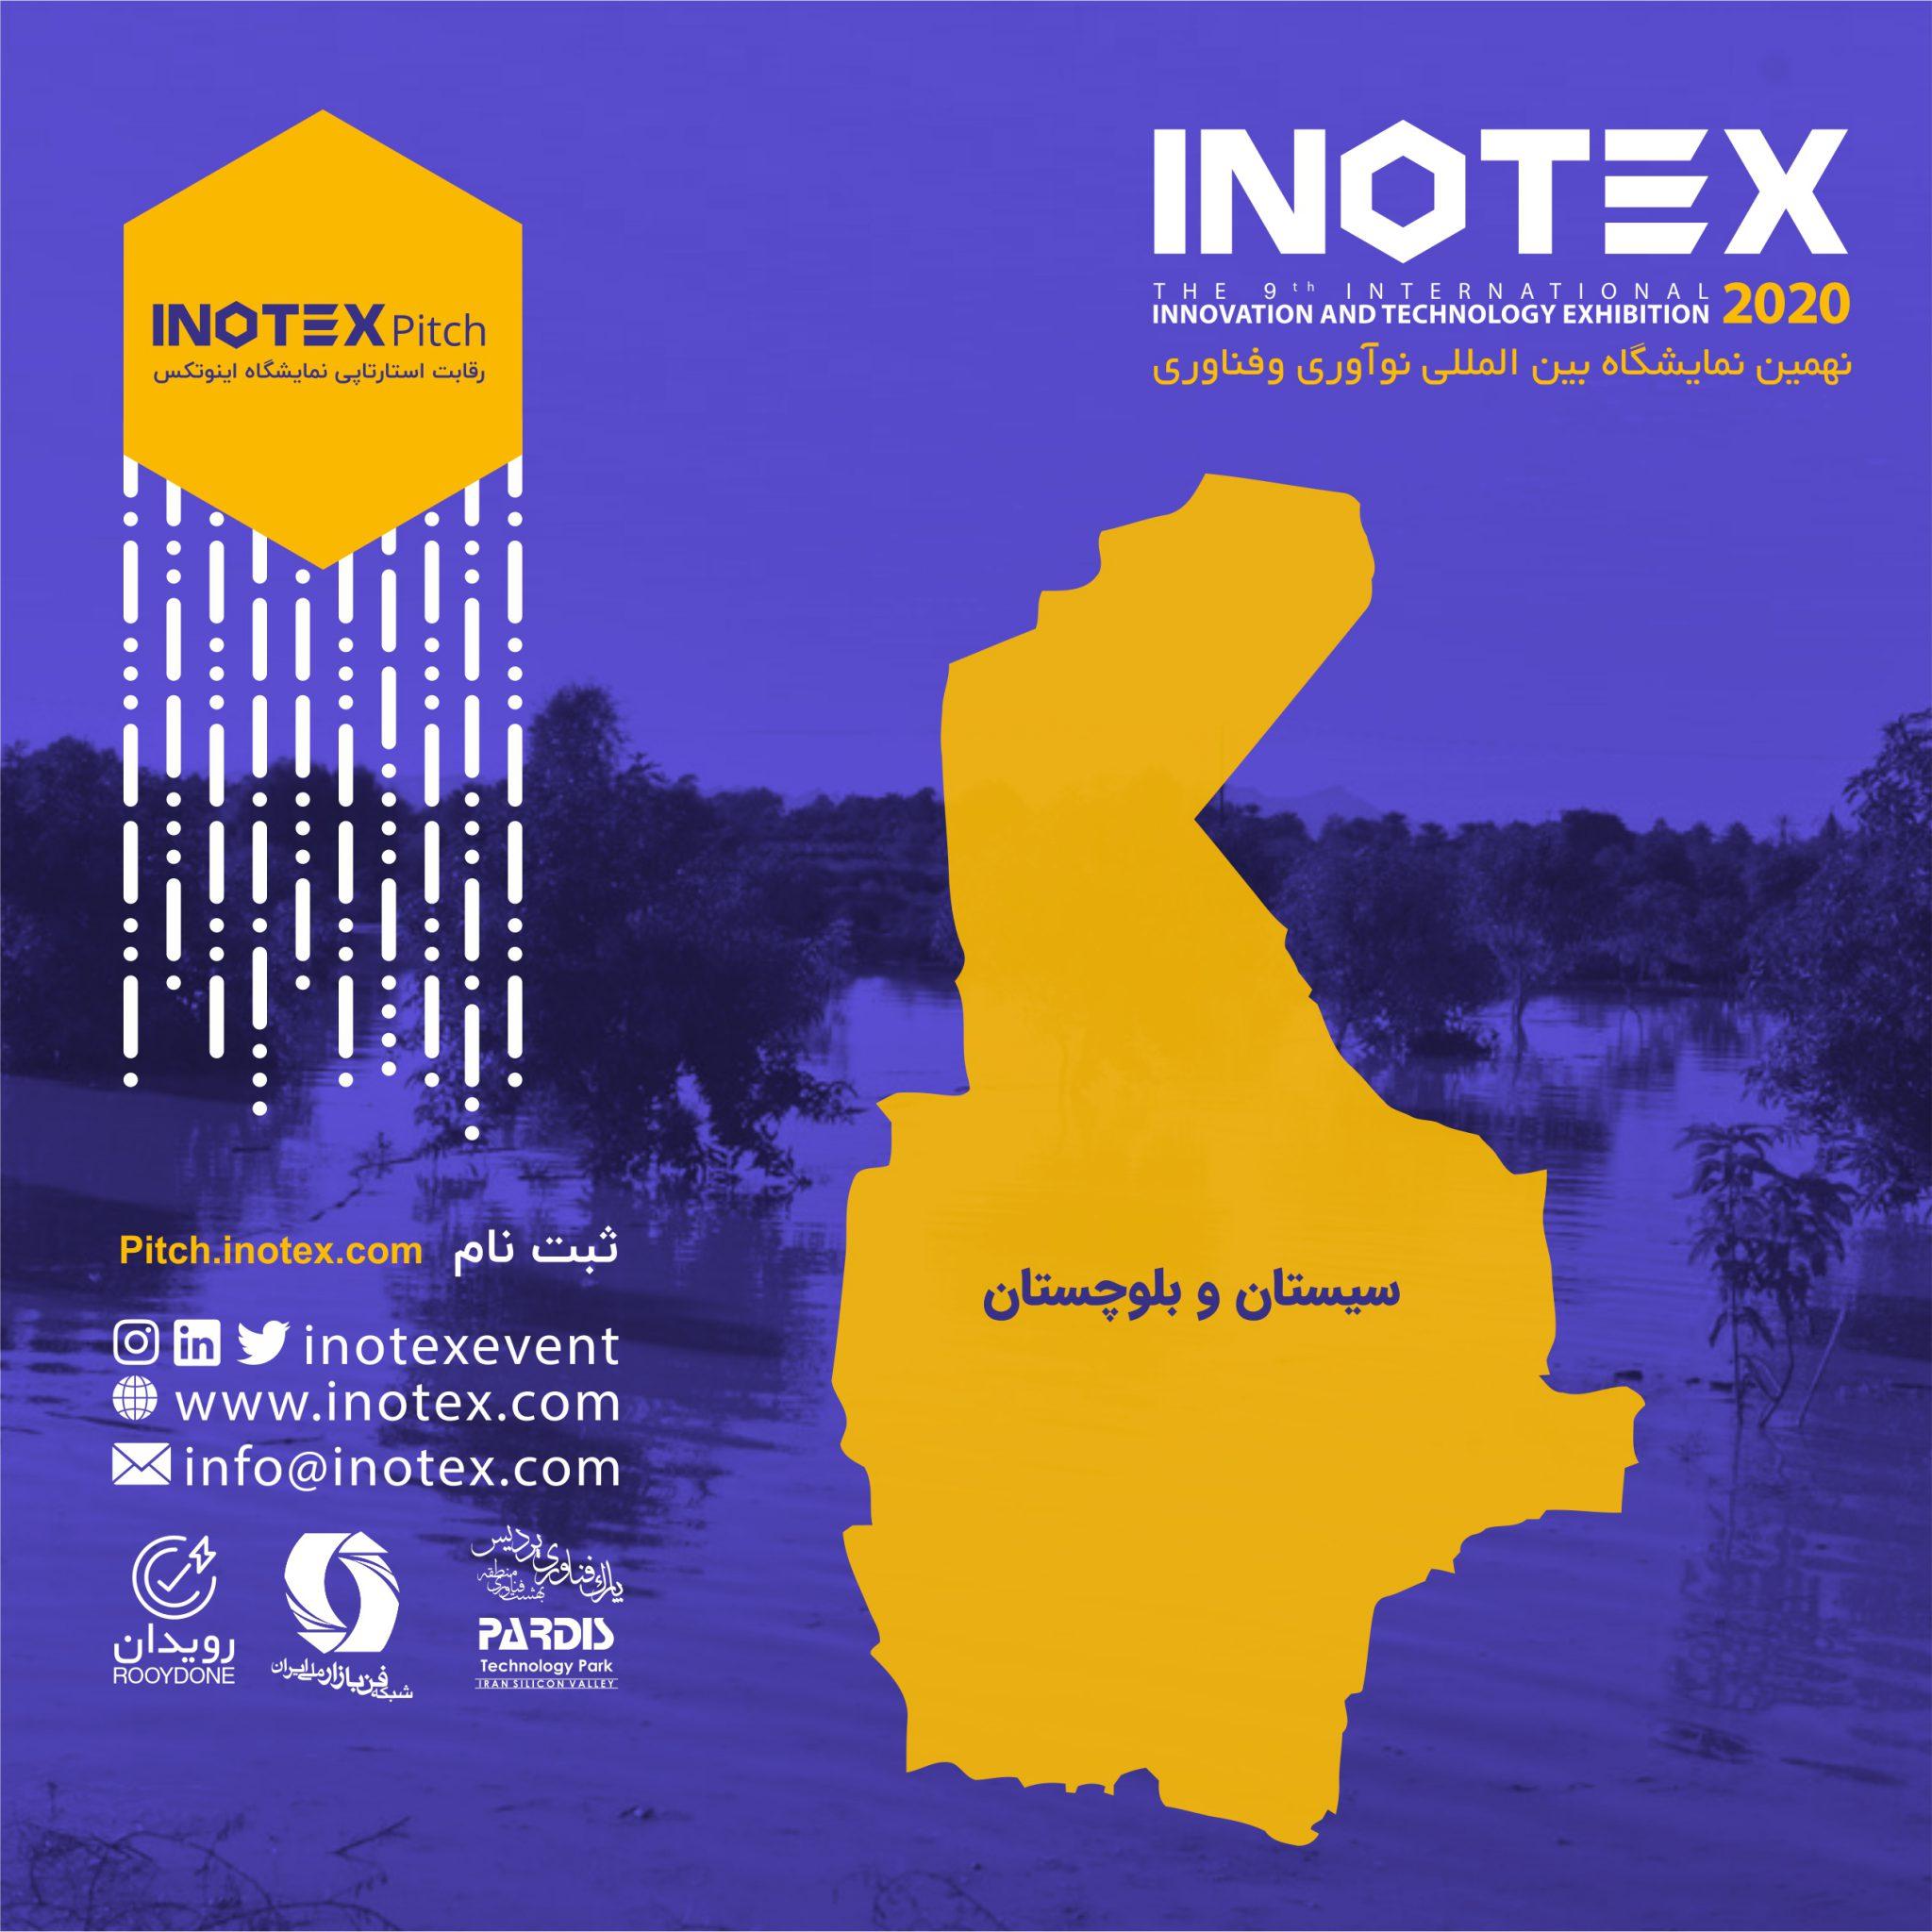 اینوتکس پیچ سیستان و بلوچستان